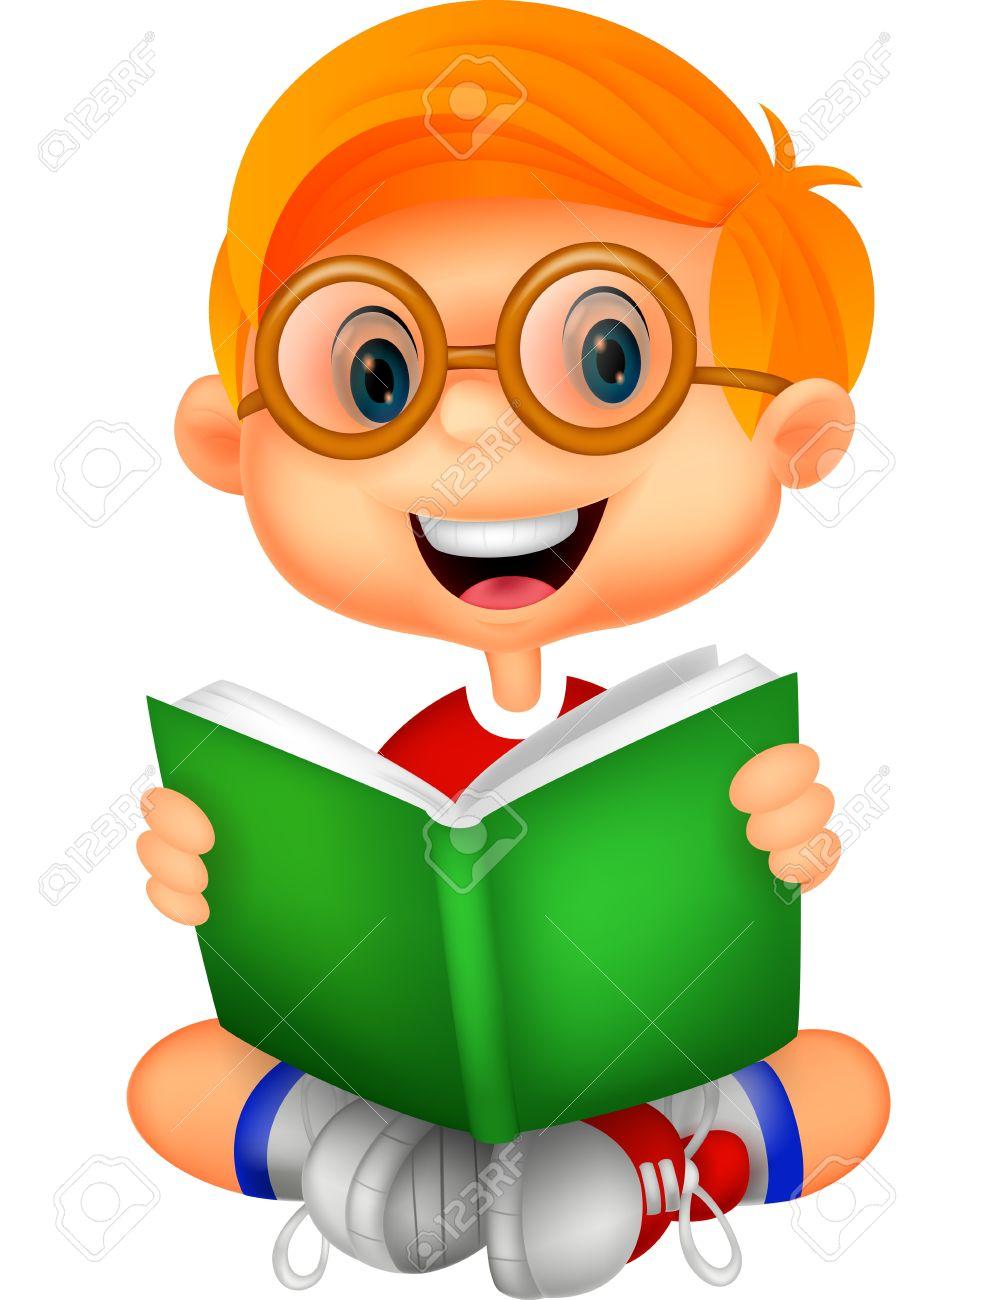 мальчик с книгой картинка